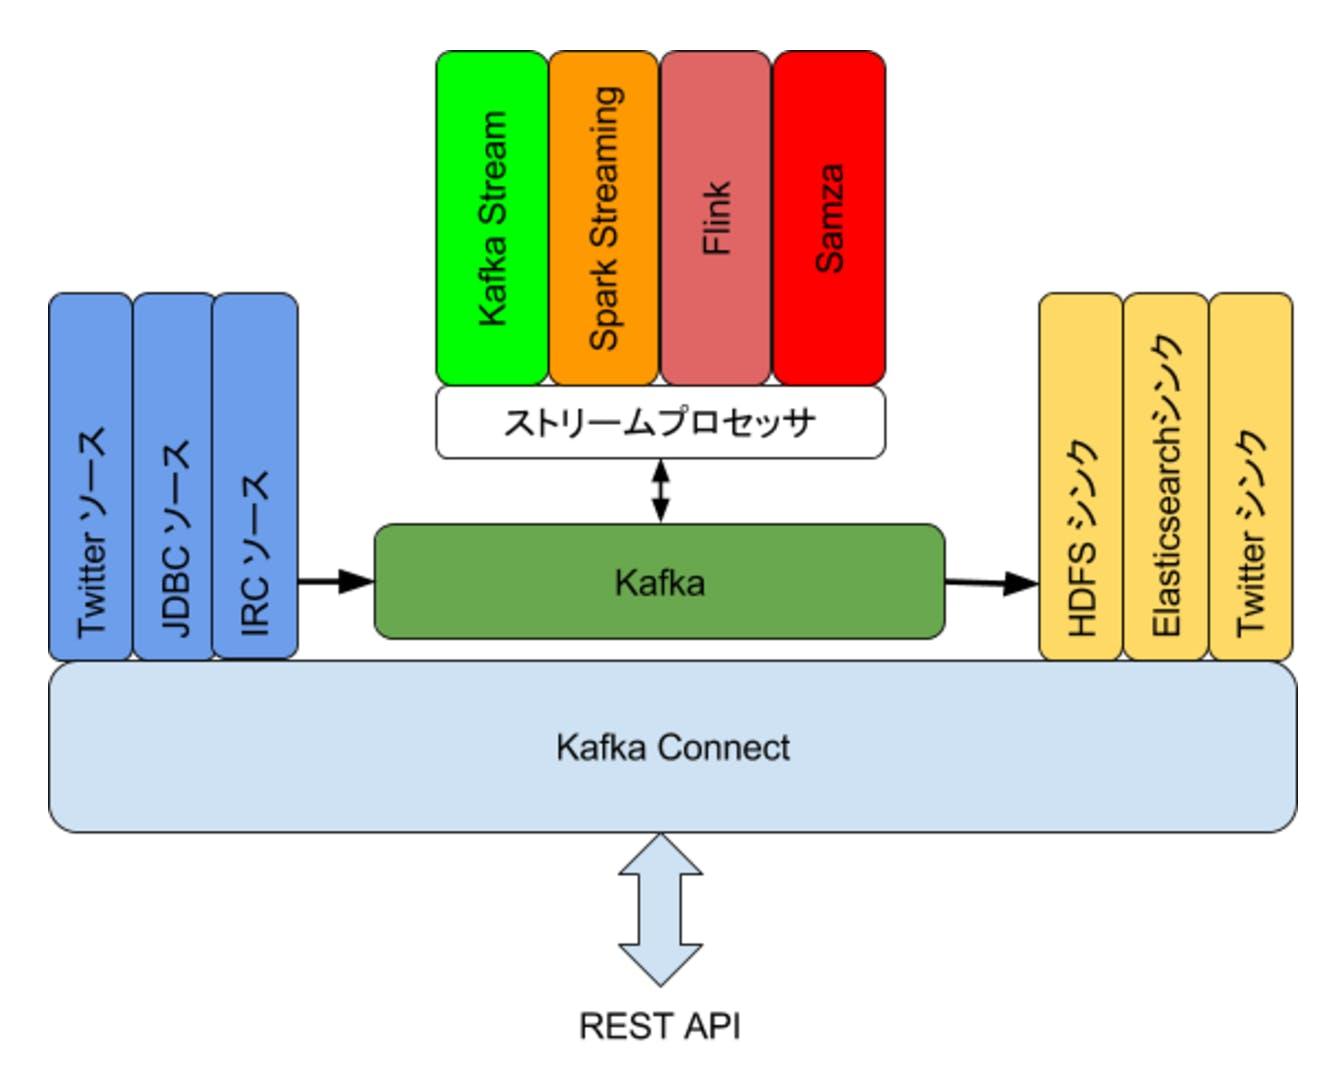 Data Integration as Service: Kafka-Connectの紹介と実験 - Qiita